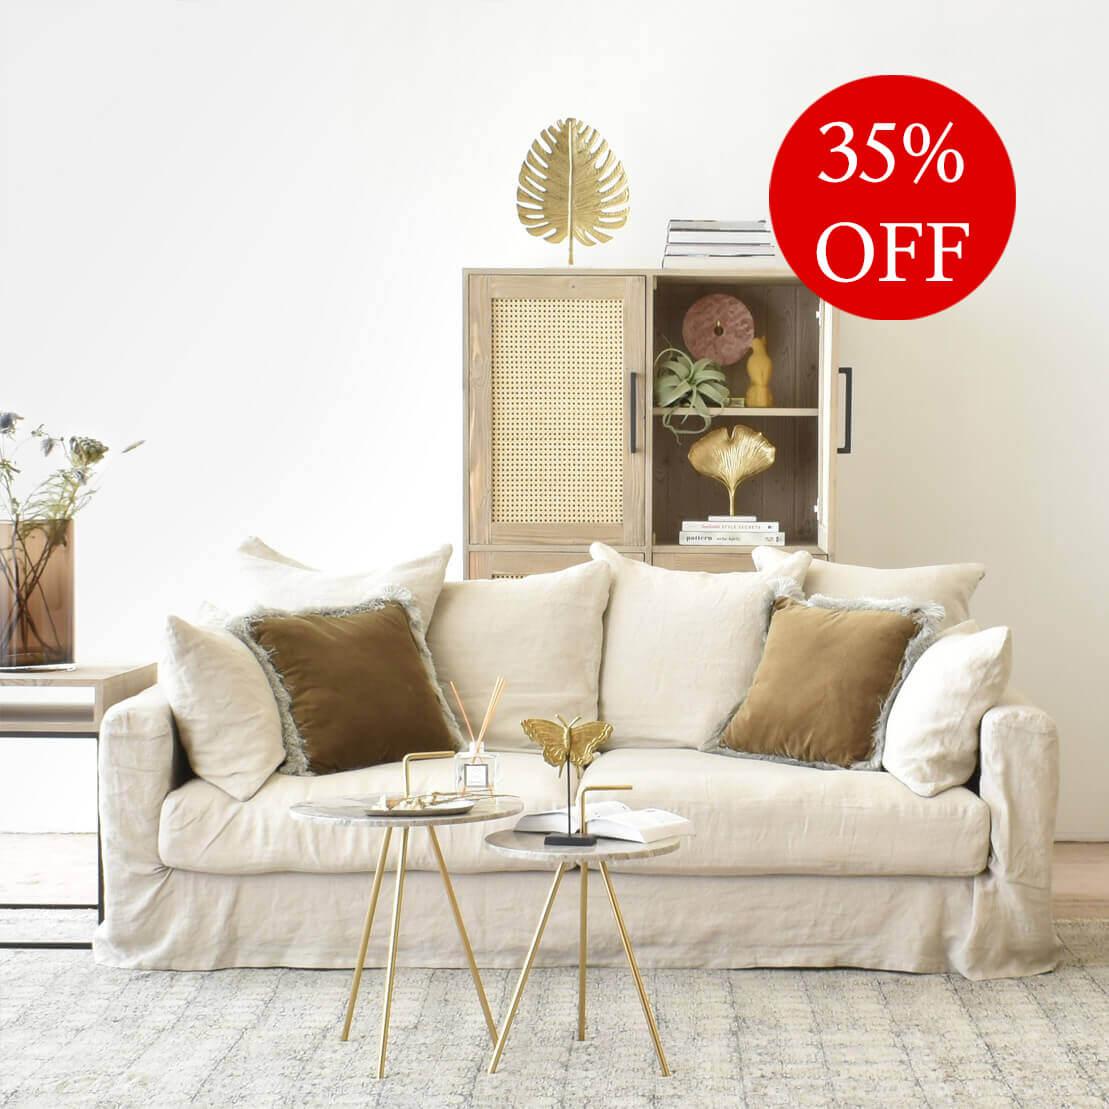 Belgian 11 Seater Linen Sofa in Natural